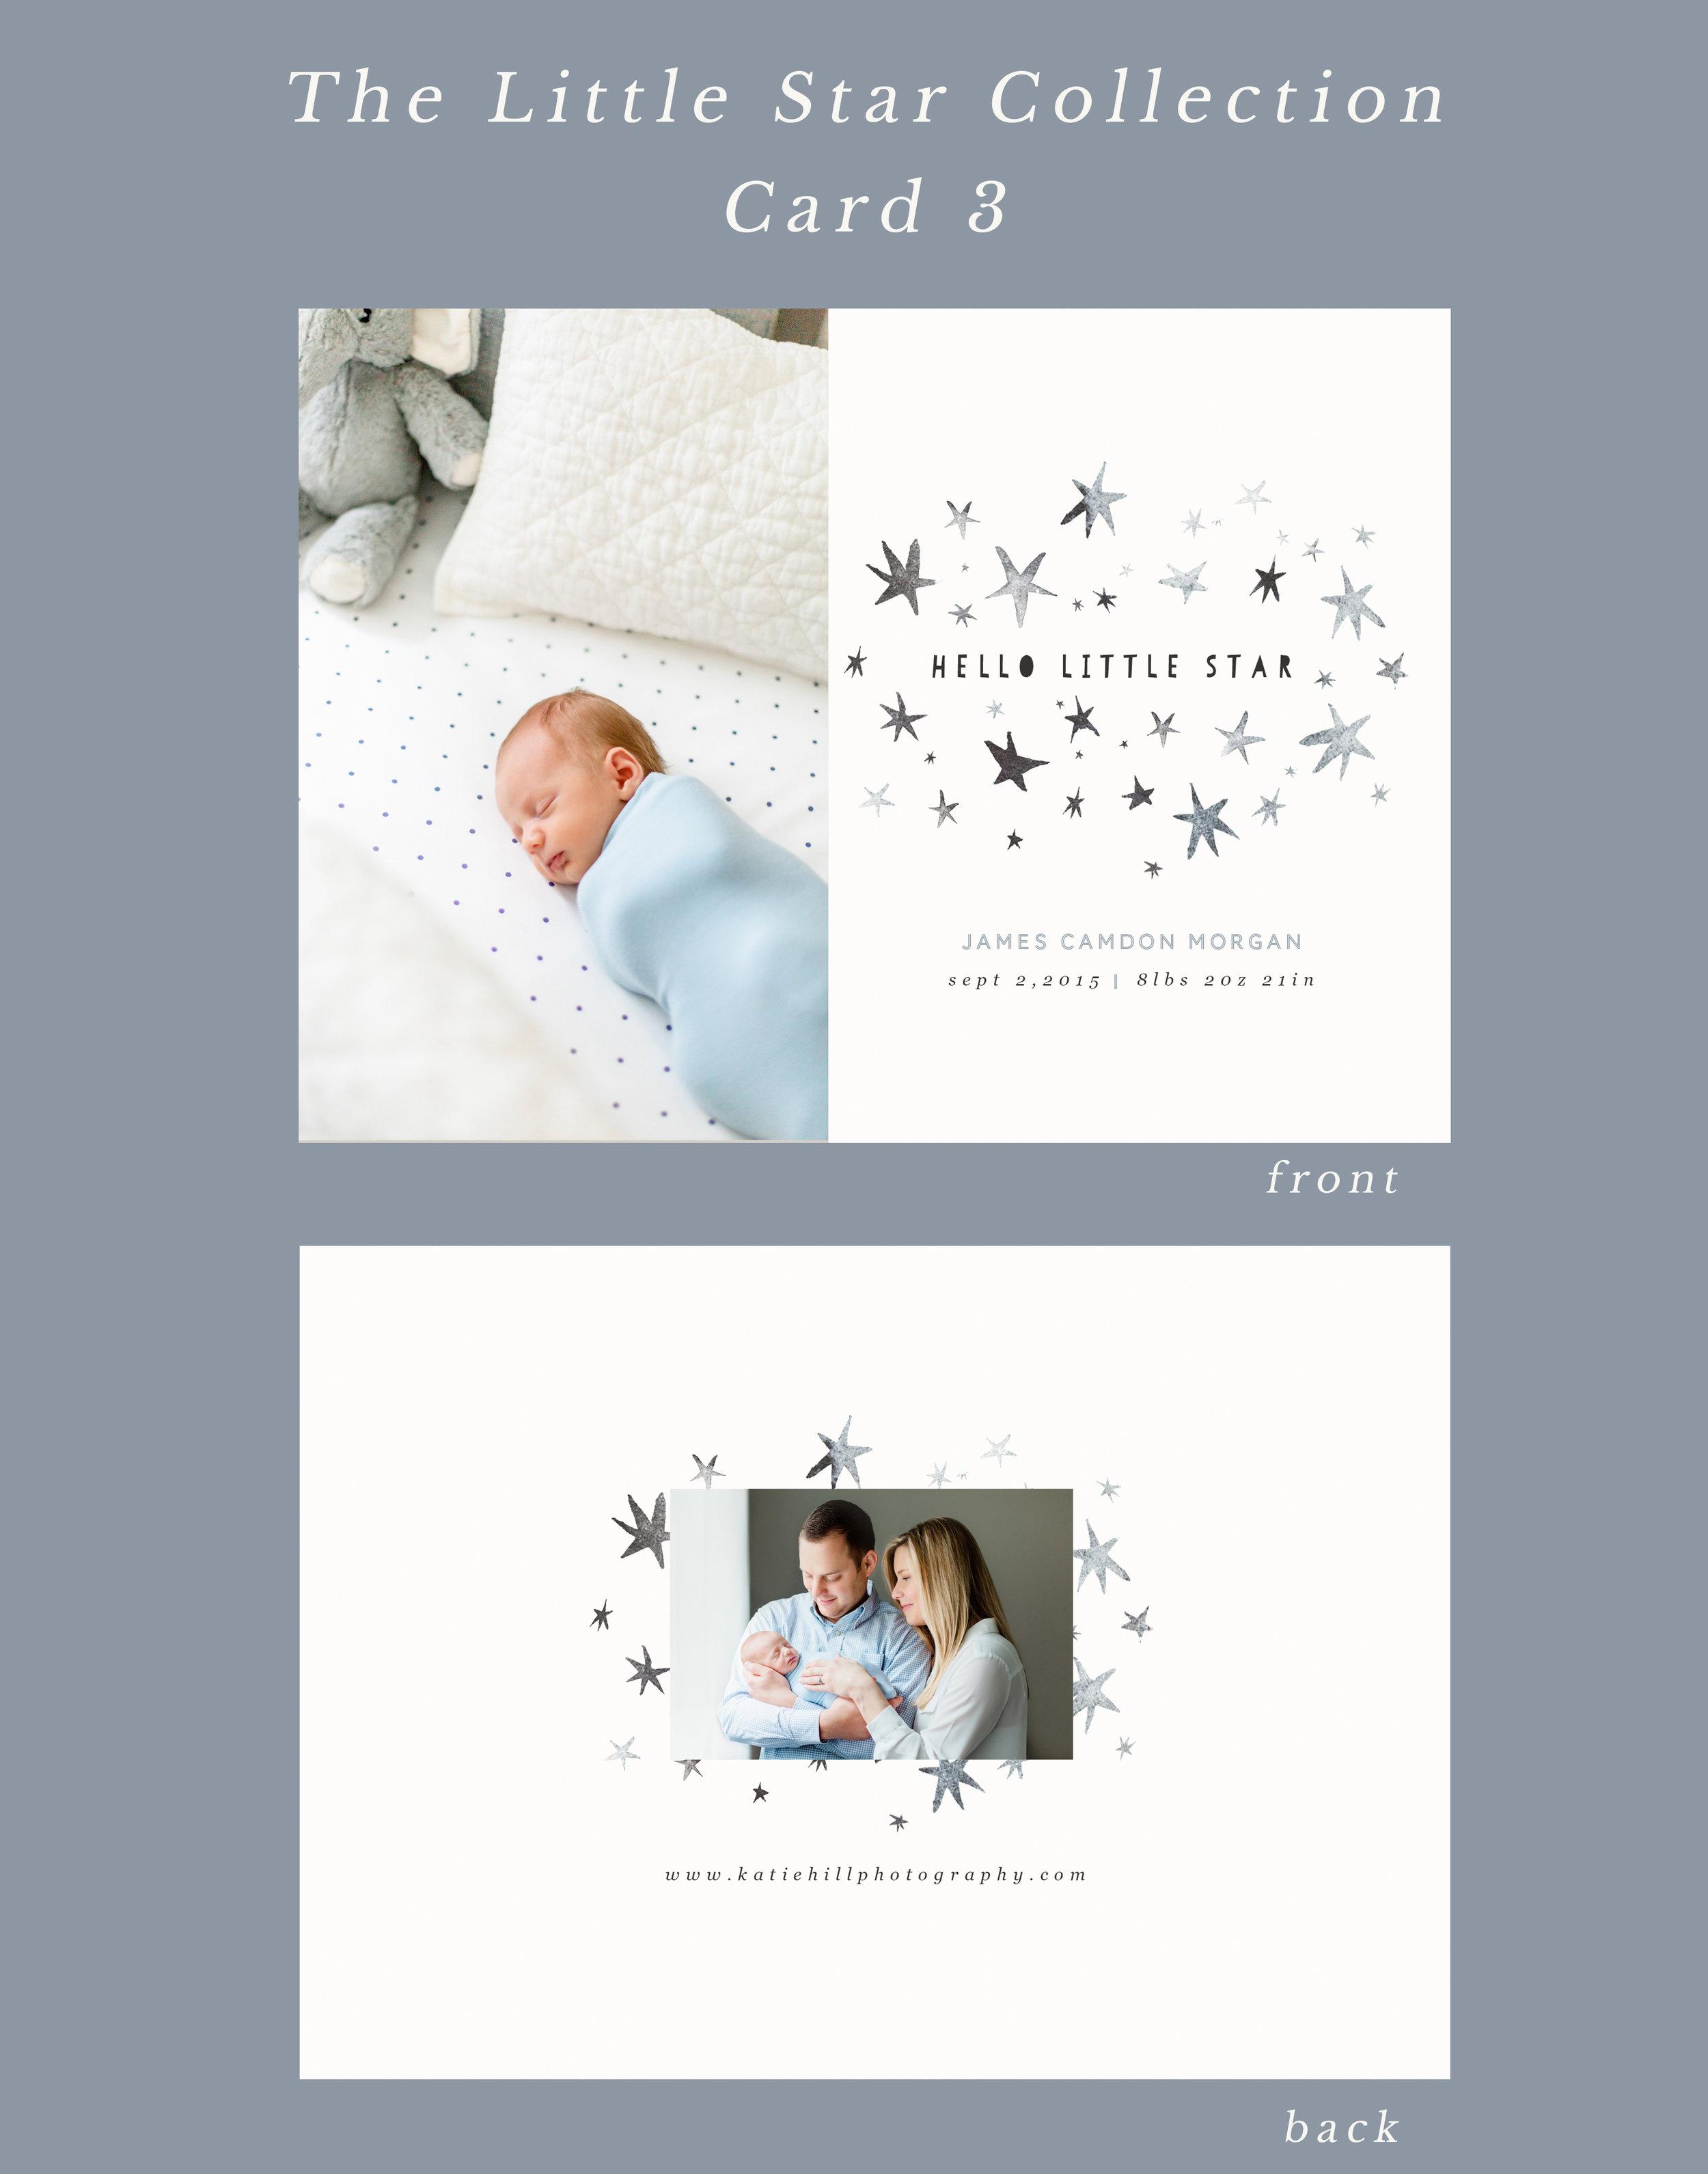 LittleStar_Card3.jpg